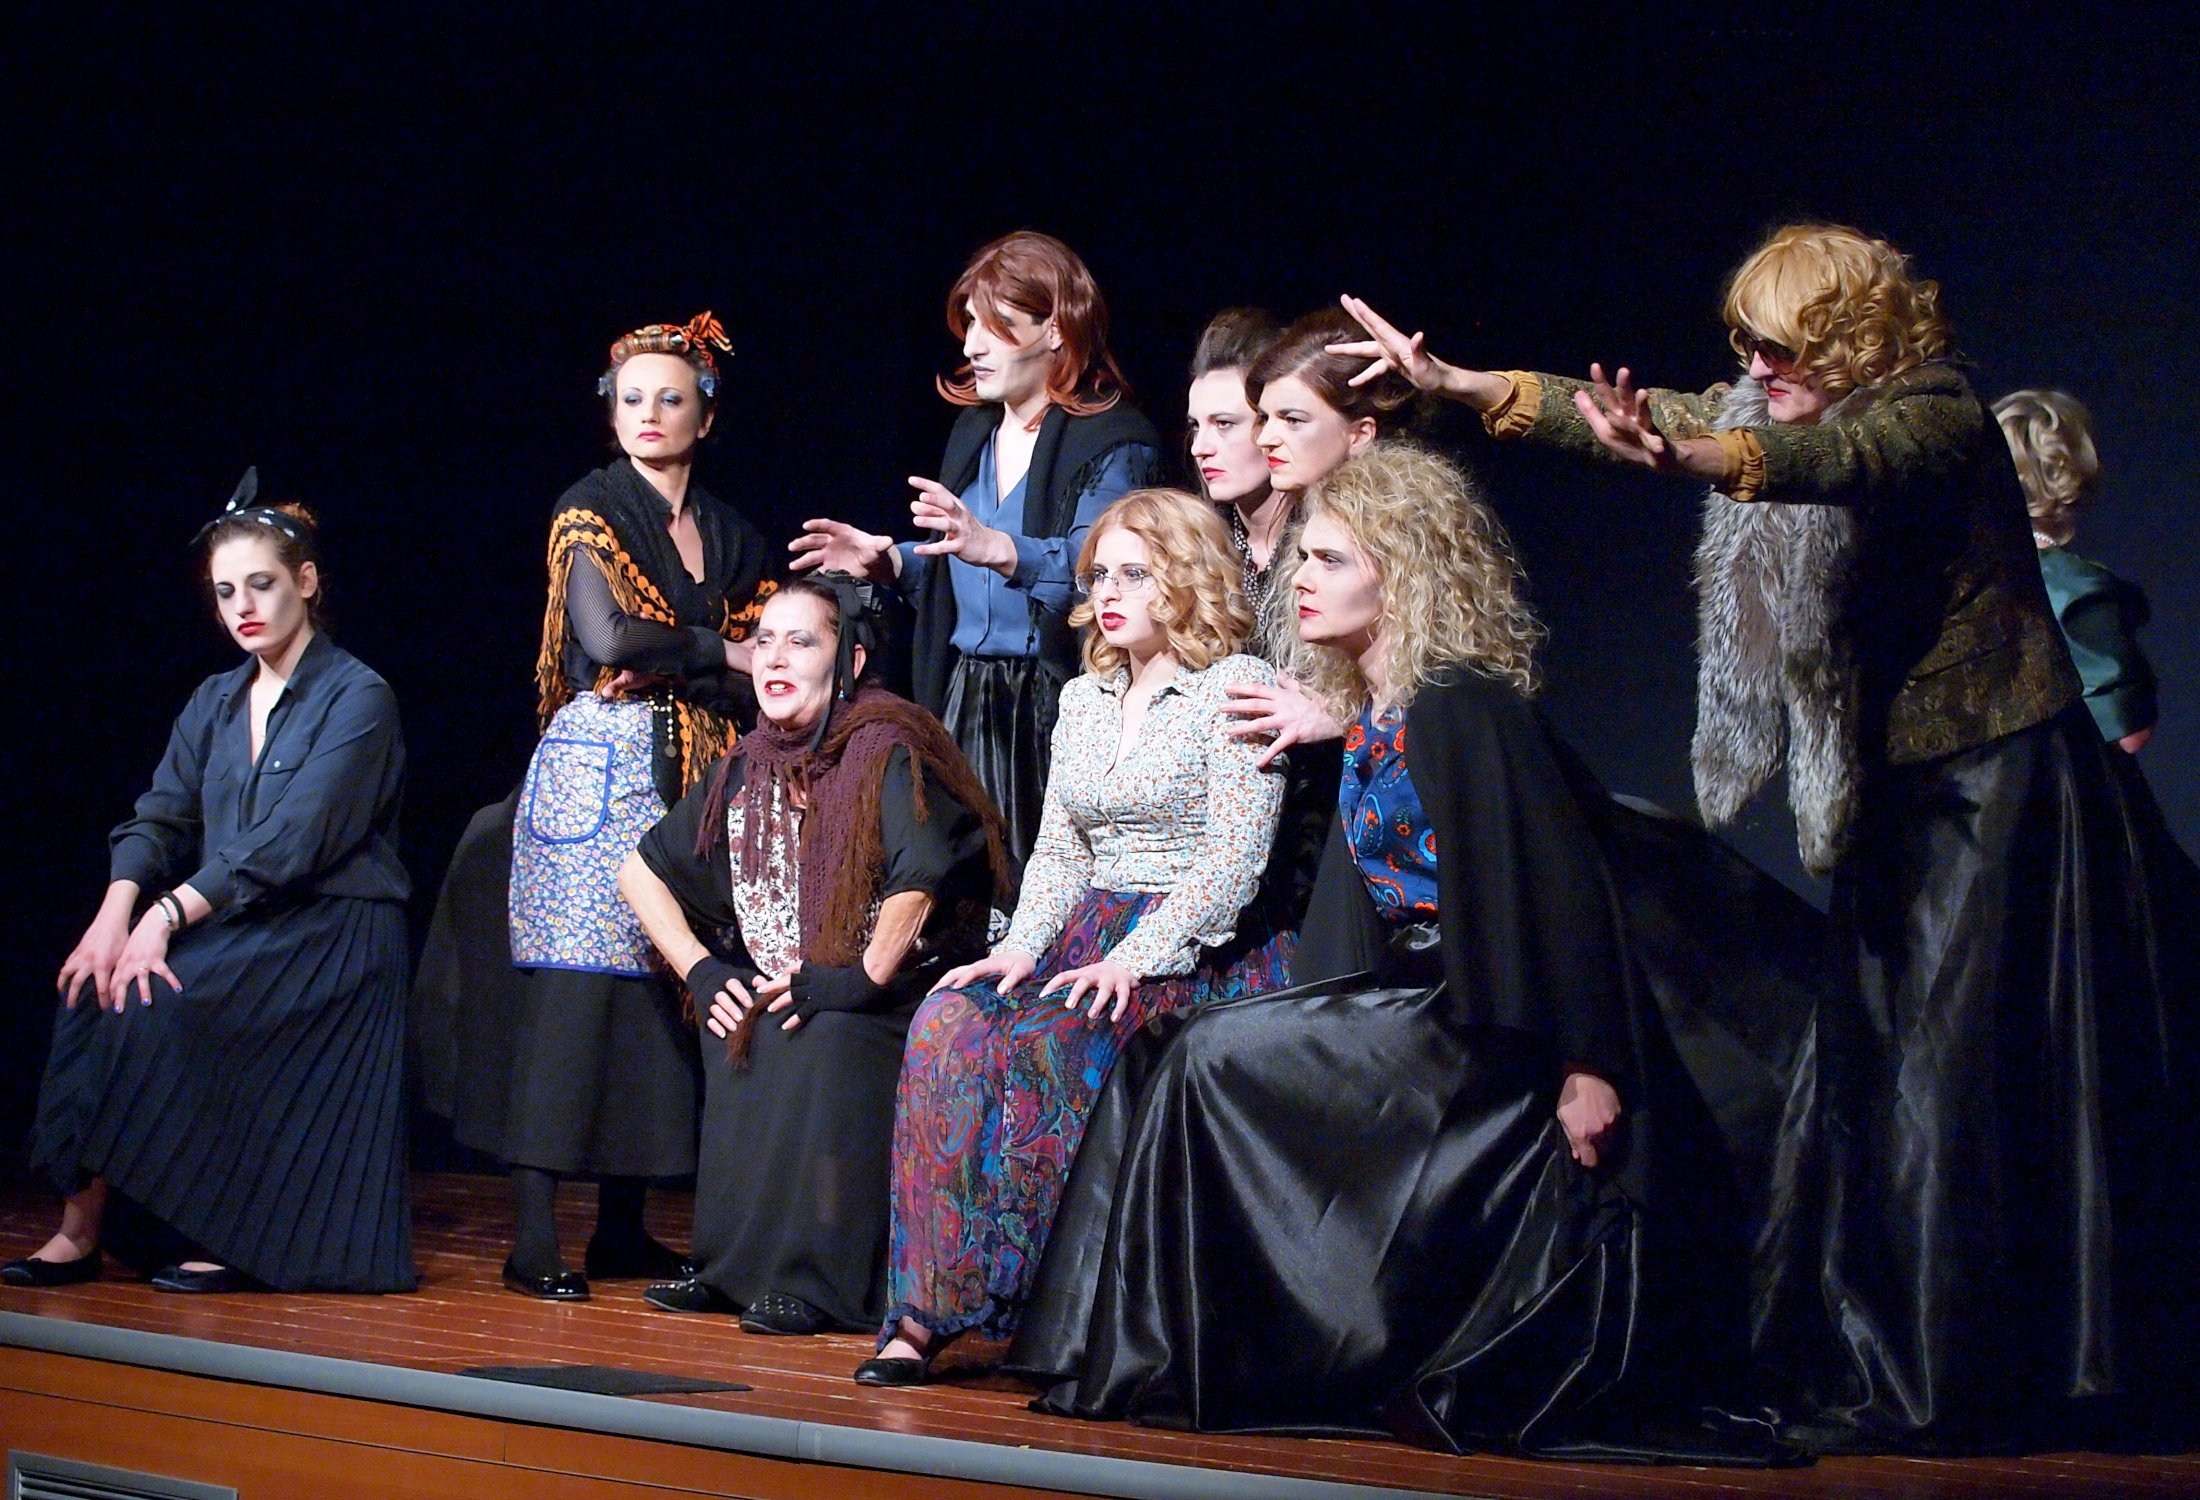 Le Acque compagnia teatrale - teatrando